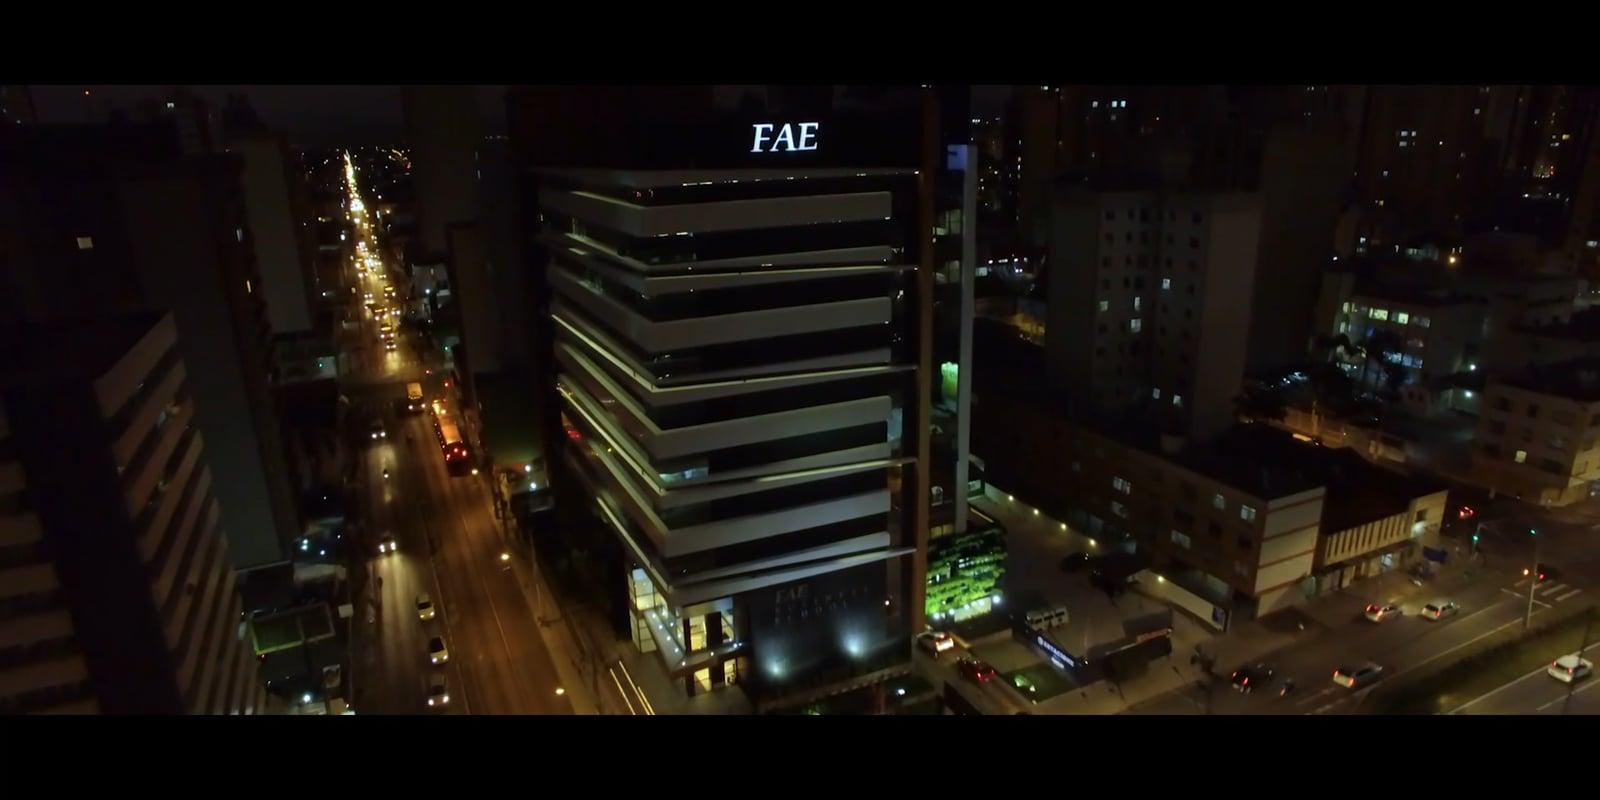 FAE - Vídeo 60 Anos